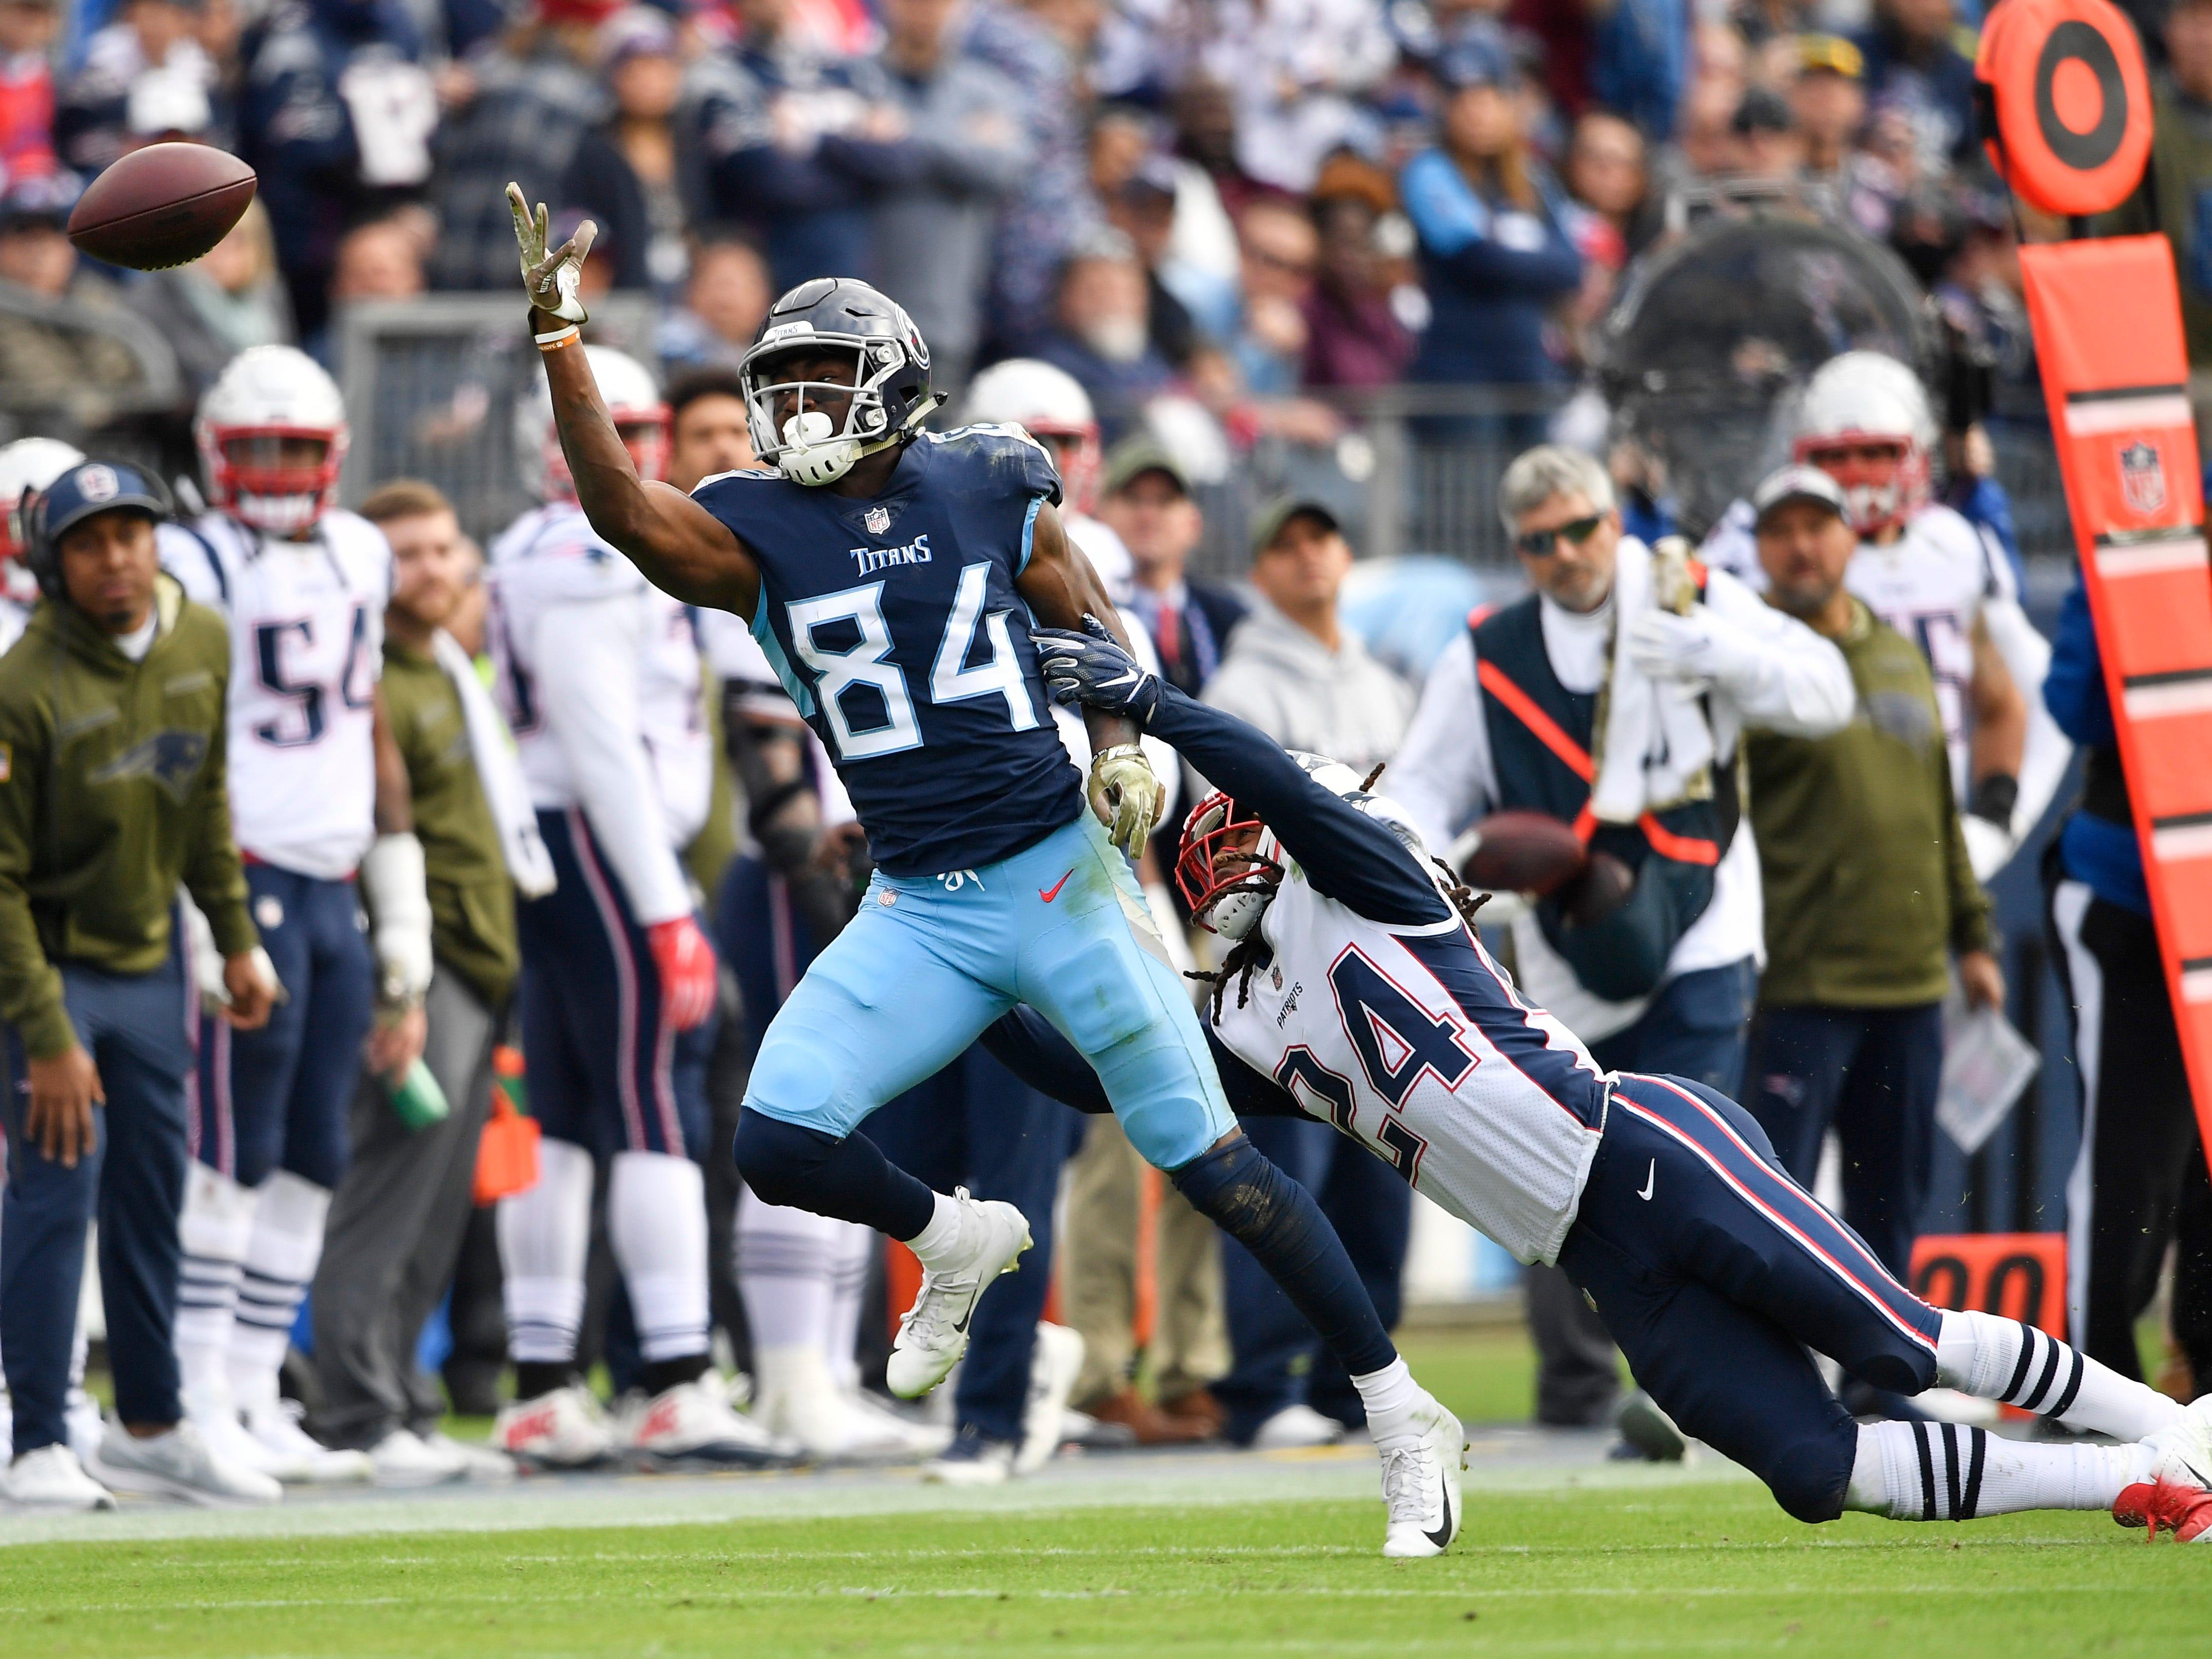 Titans 34, Patriots 10: 60-second recap and you know it all